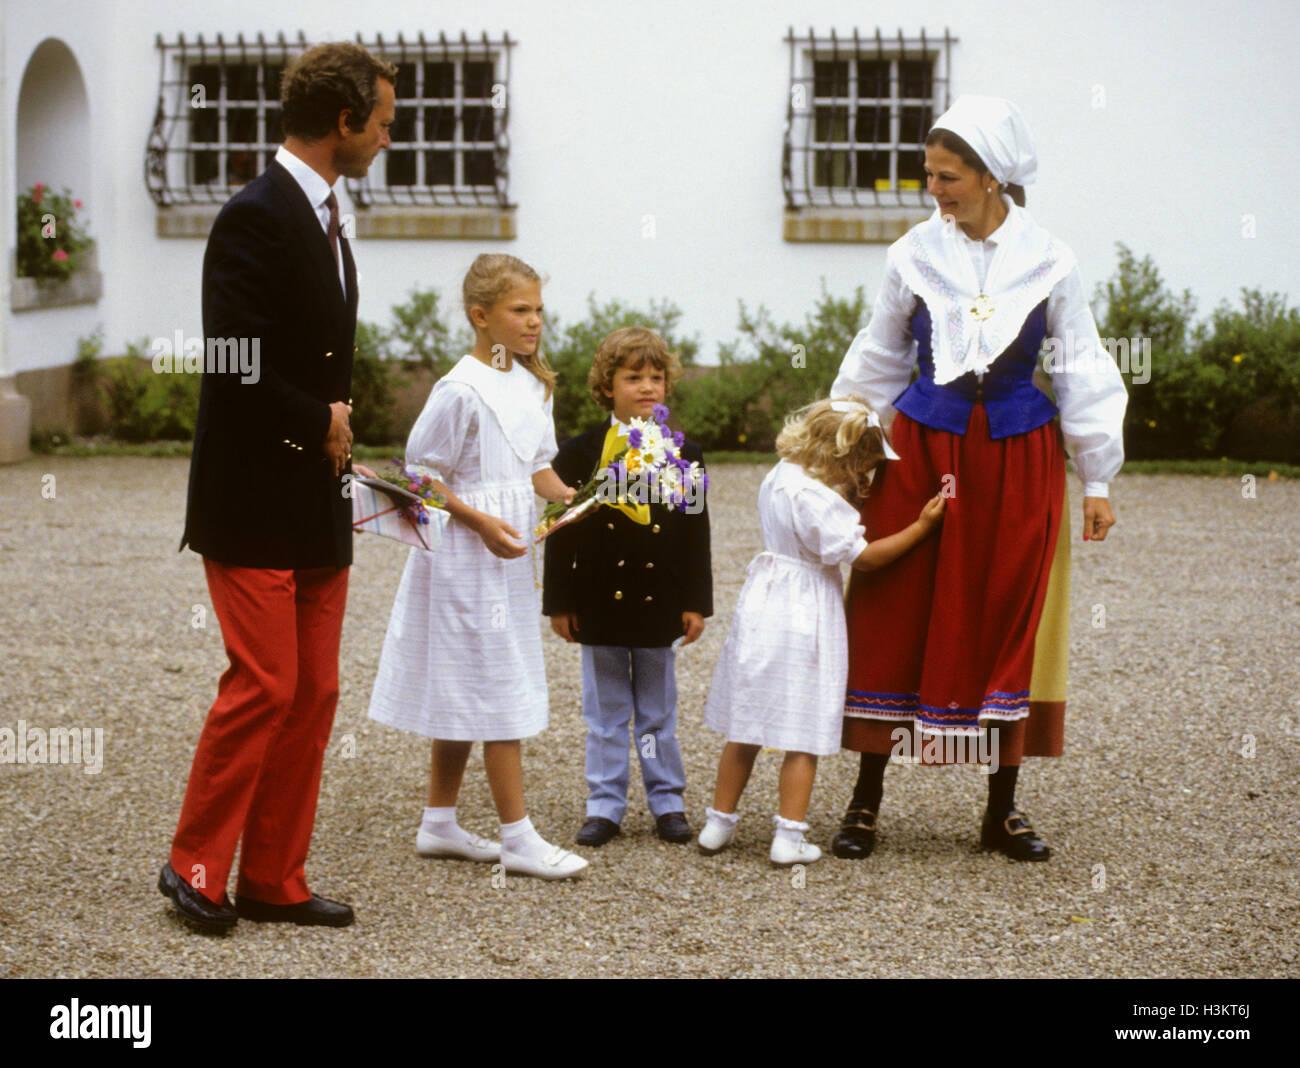 royal-family-at-land-when-crown-princess-victoria-celebrate-her-birthday-H3KT6J.jpg